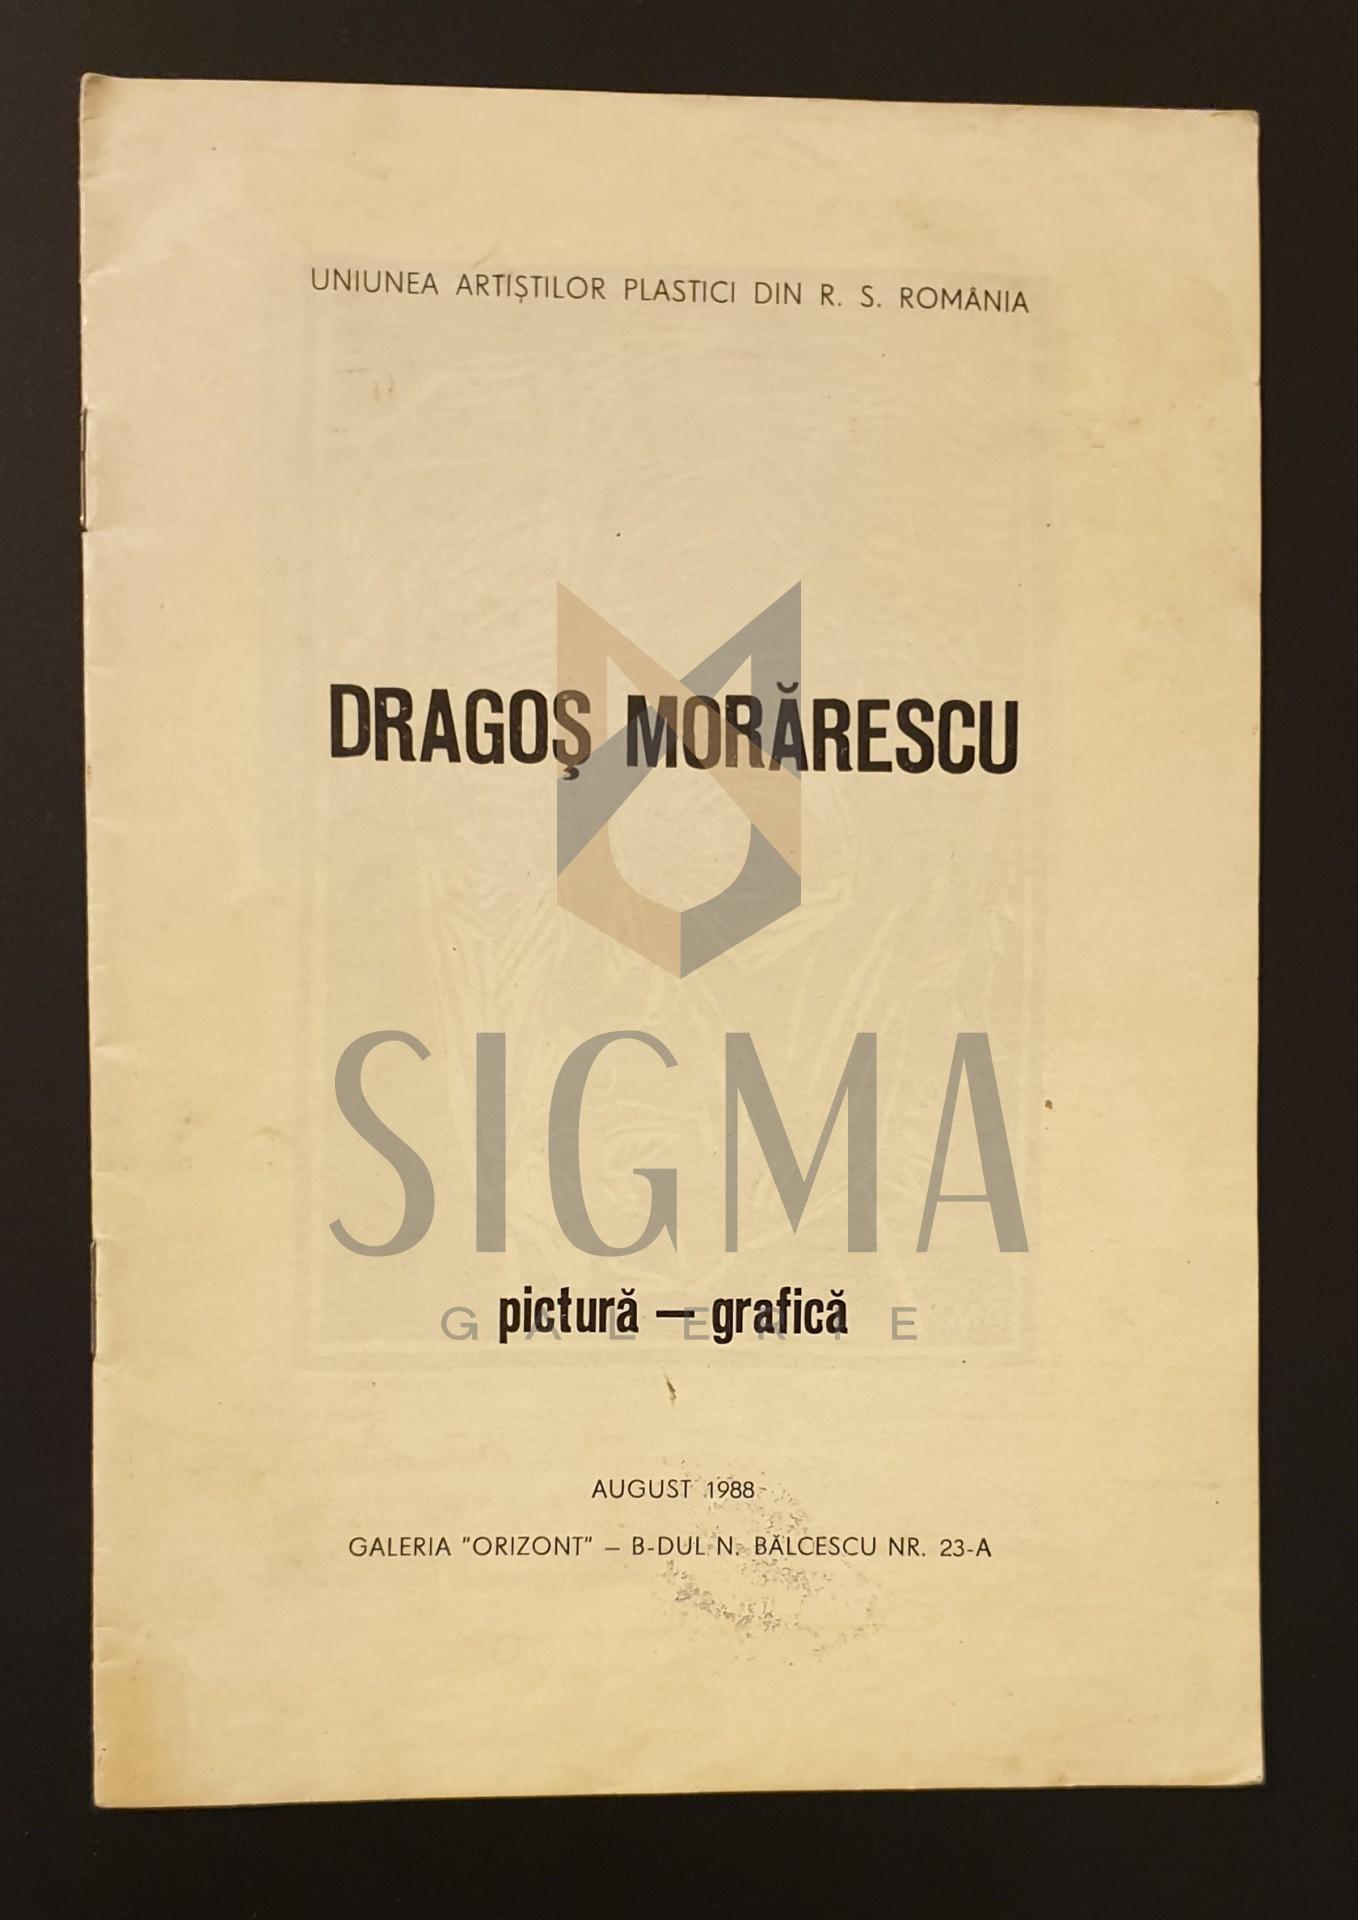 Brosura de expozitie  *  Dragos Morarescu  *  pictura-grafica